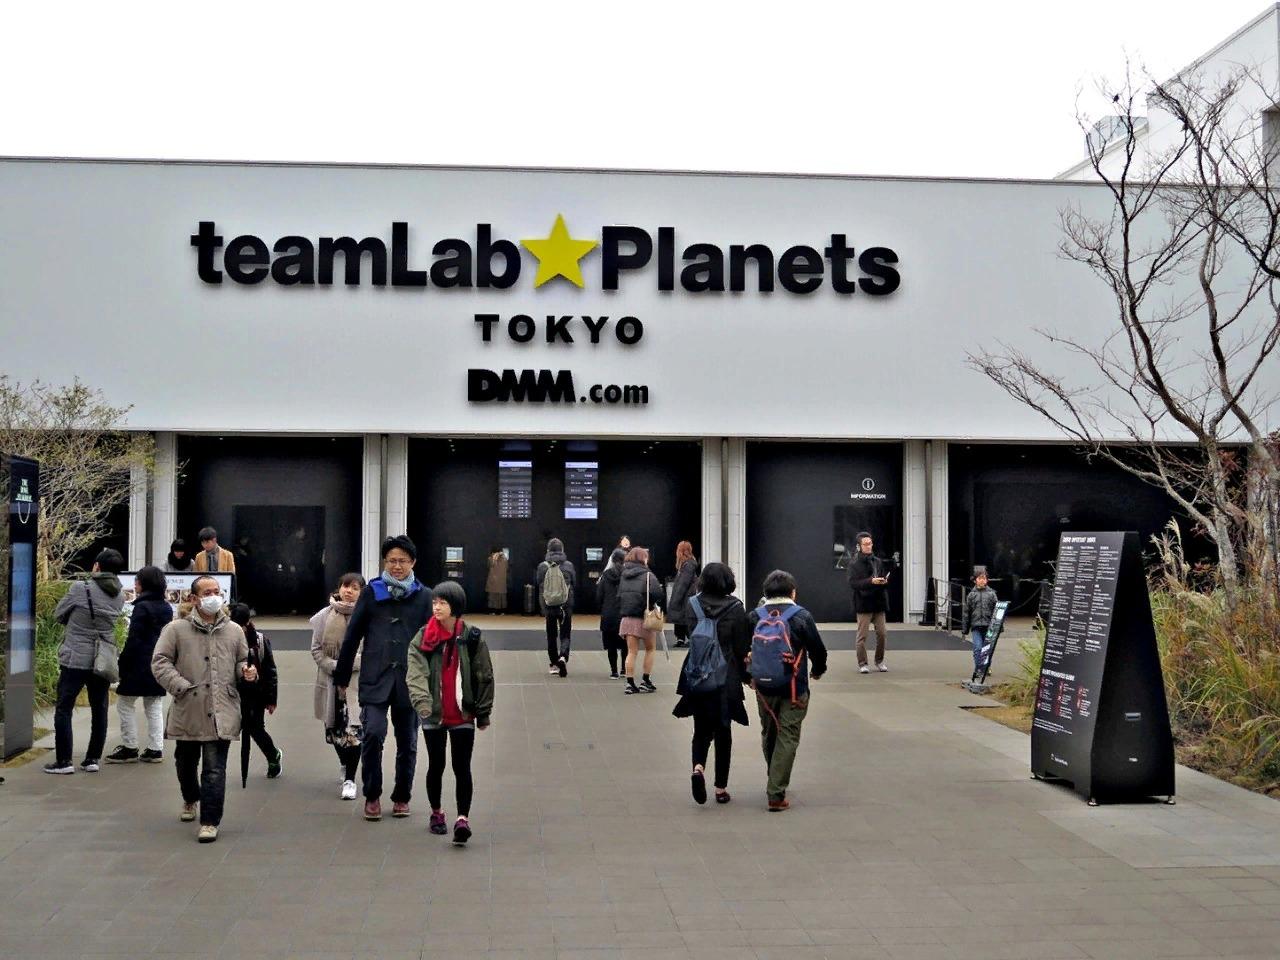 Вход в TeamLab Planets, Токио.